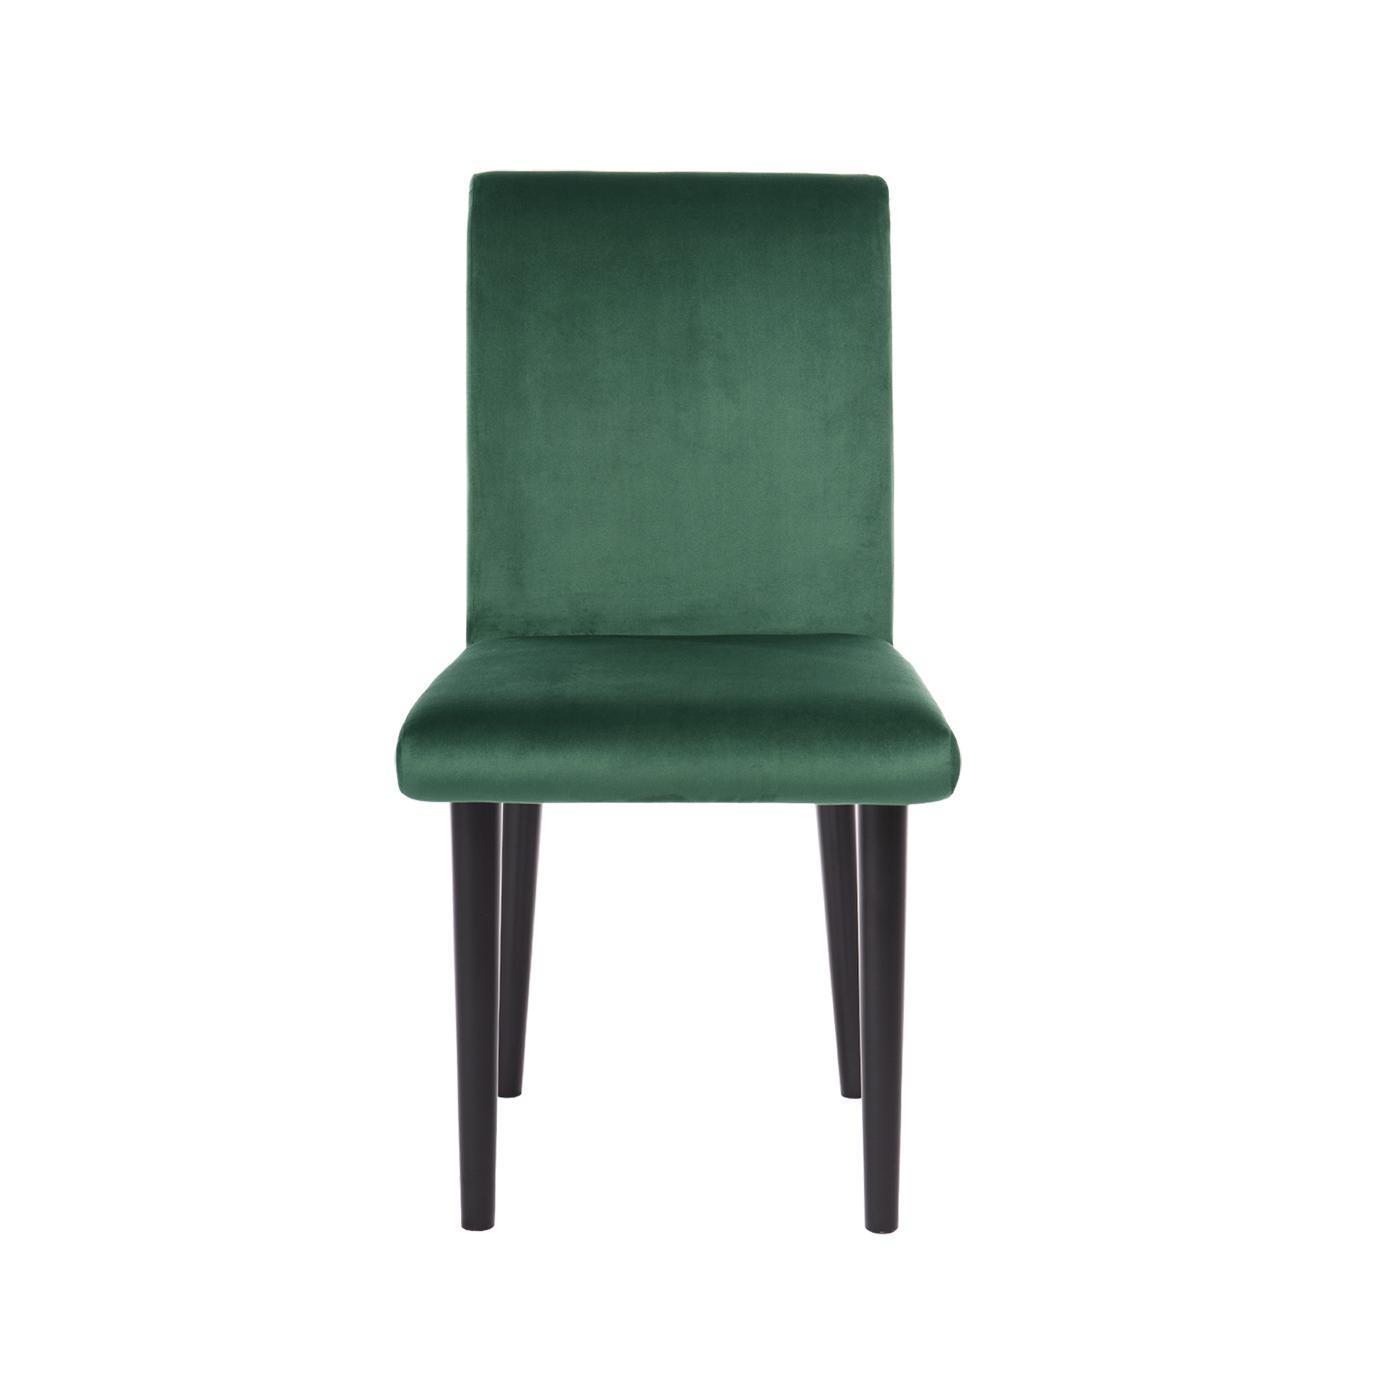 Pompeii Green Black Chair (Clearance)